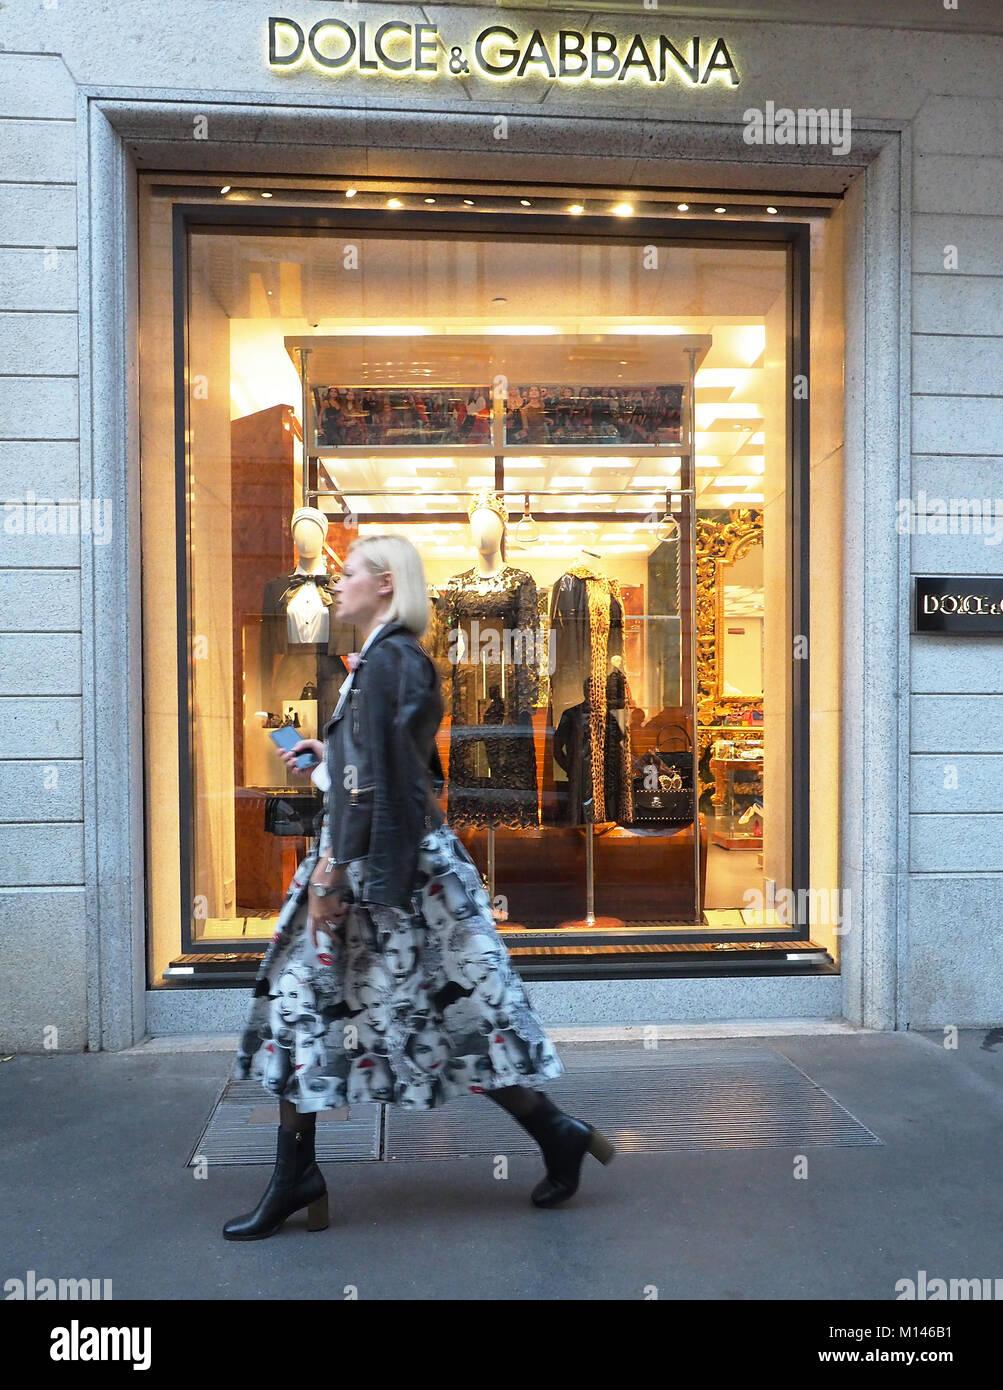 Italy,Lombardy,Milan,Via Montenapoleone, Dolce & Gabbana fashion shop - Stock Image